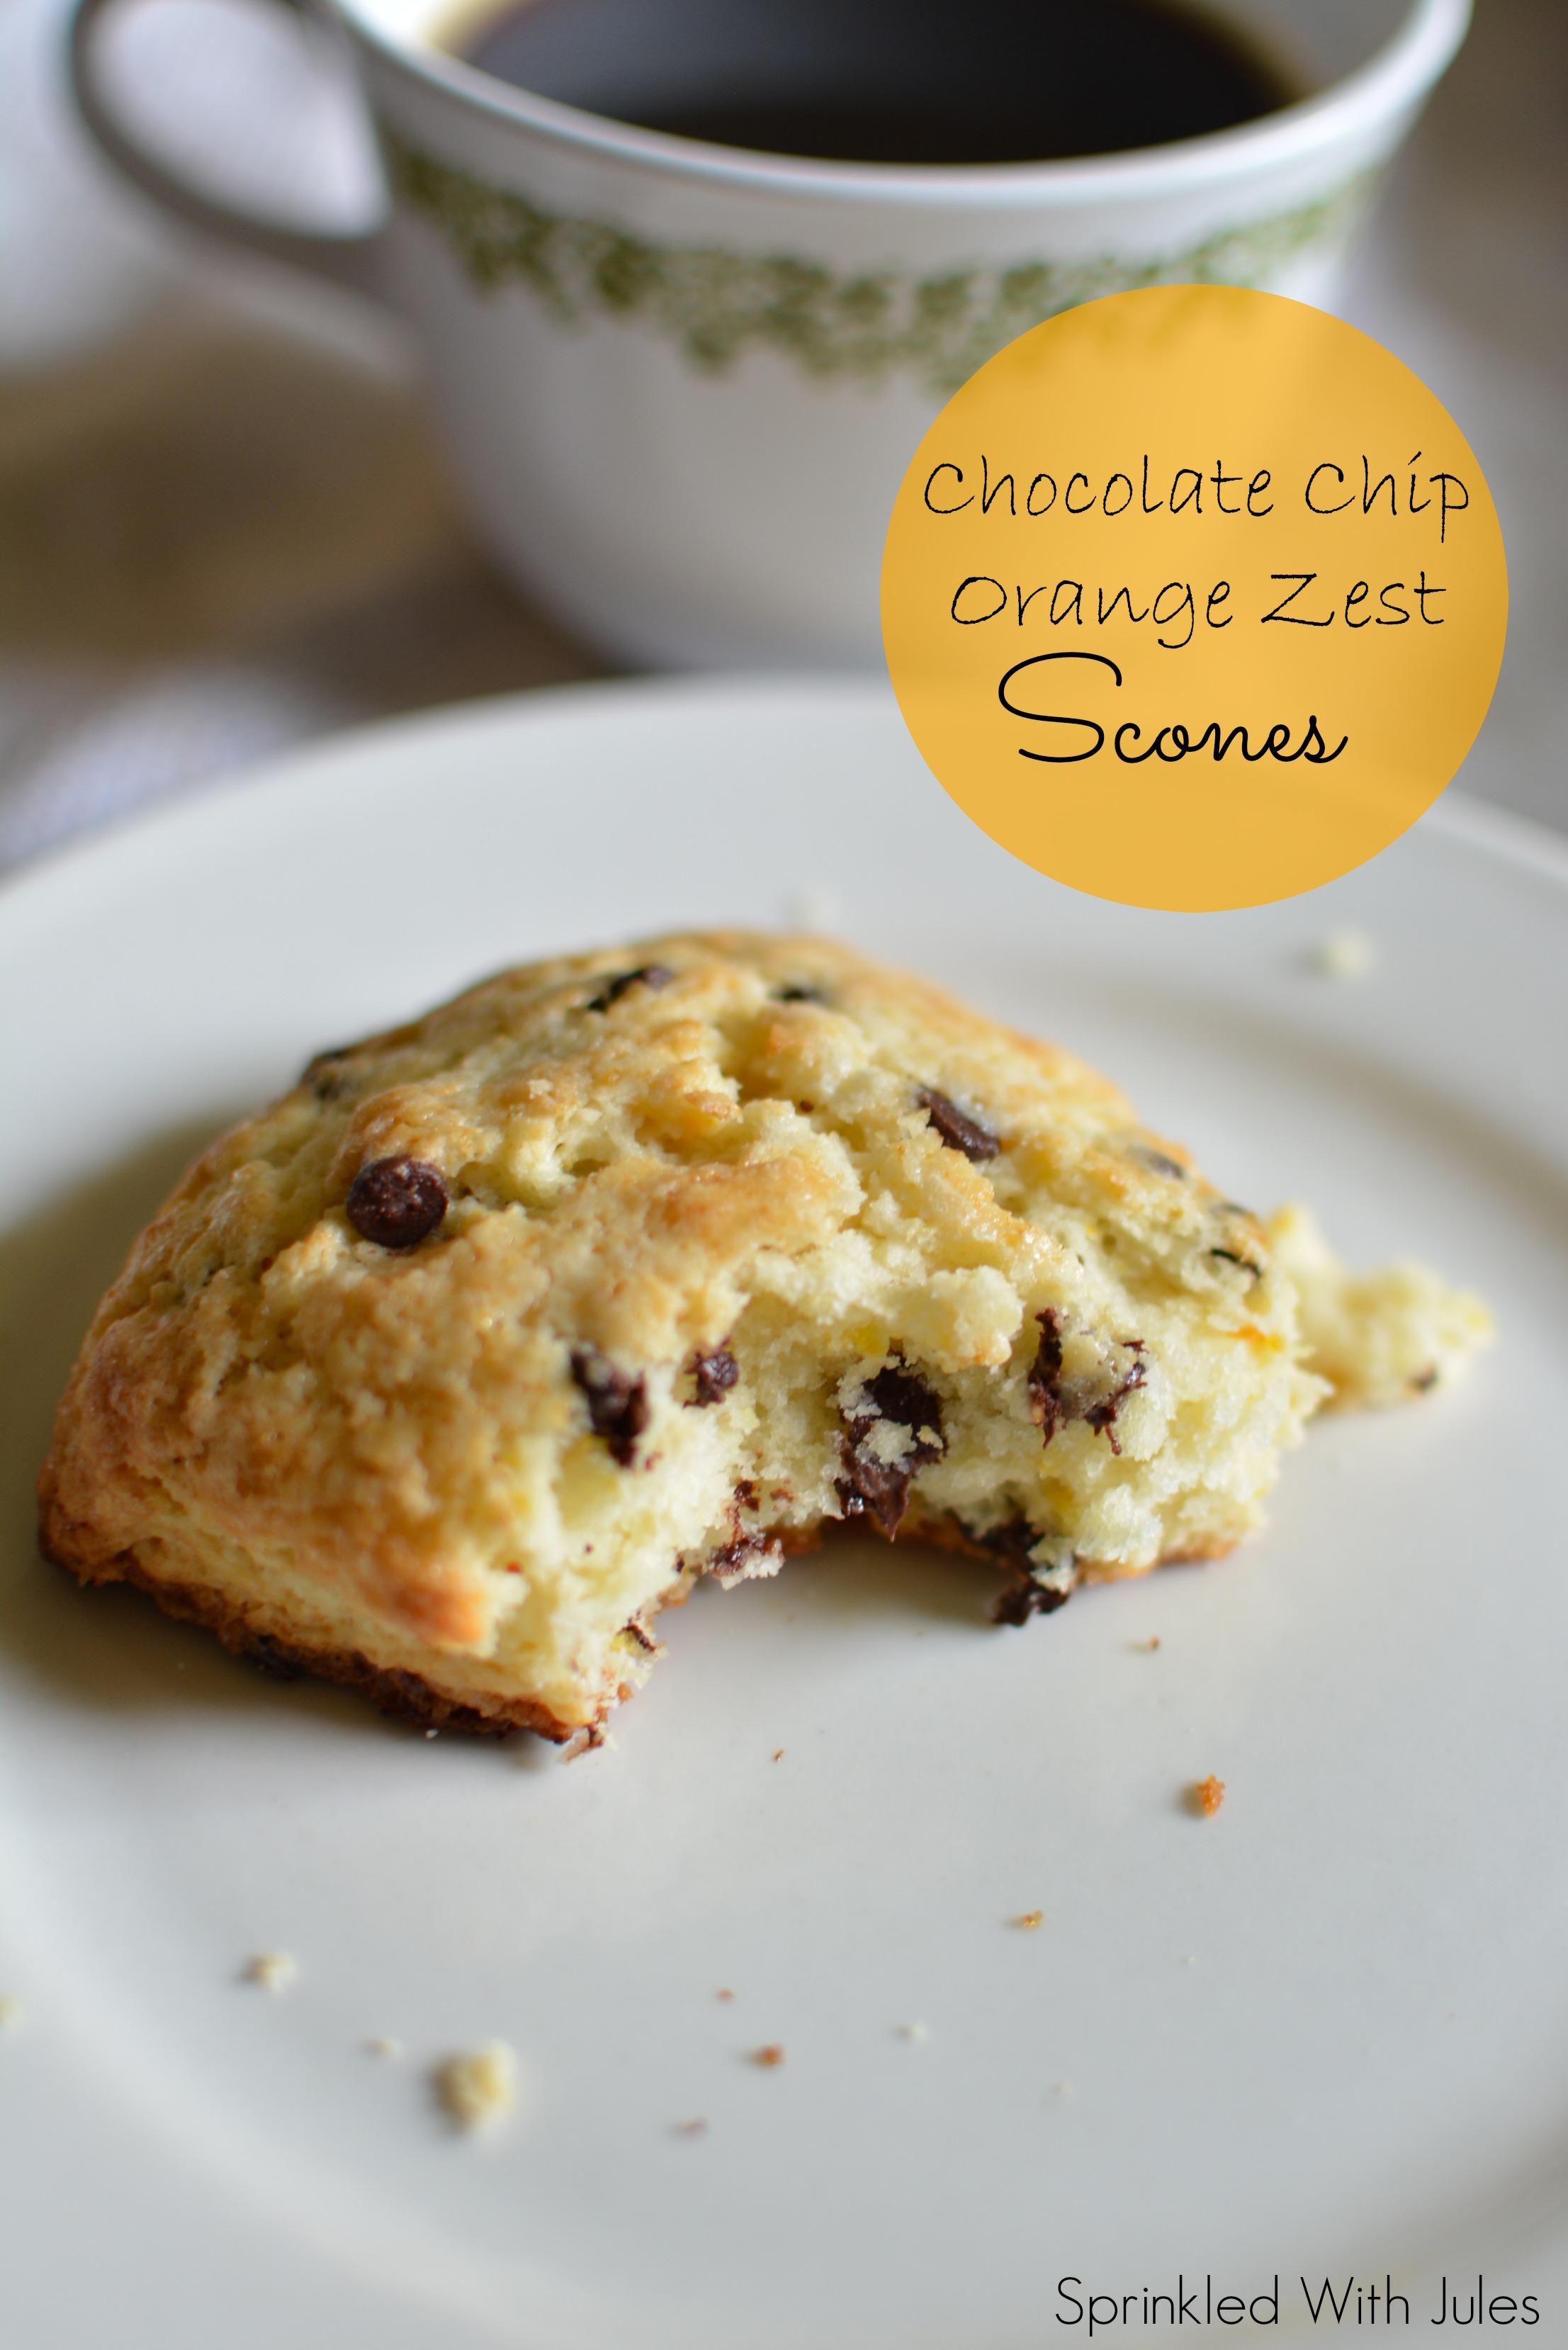 Chocolate Chip Orange Zest Scones / Sprinkled With Jules